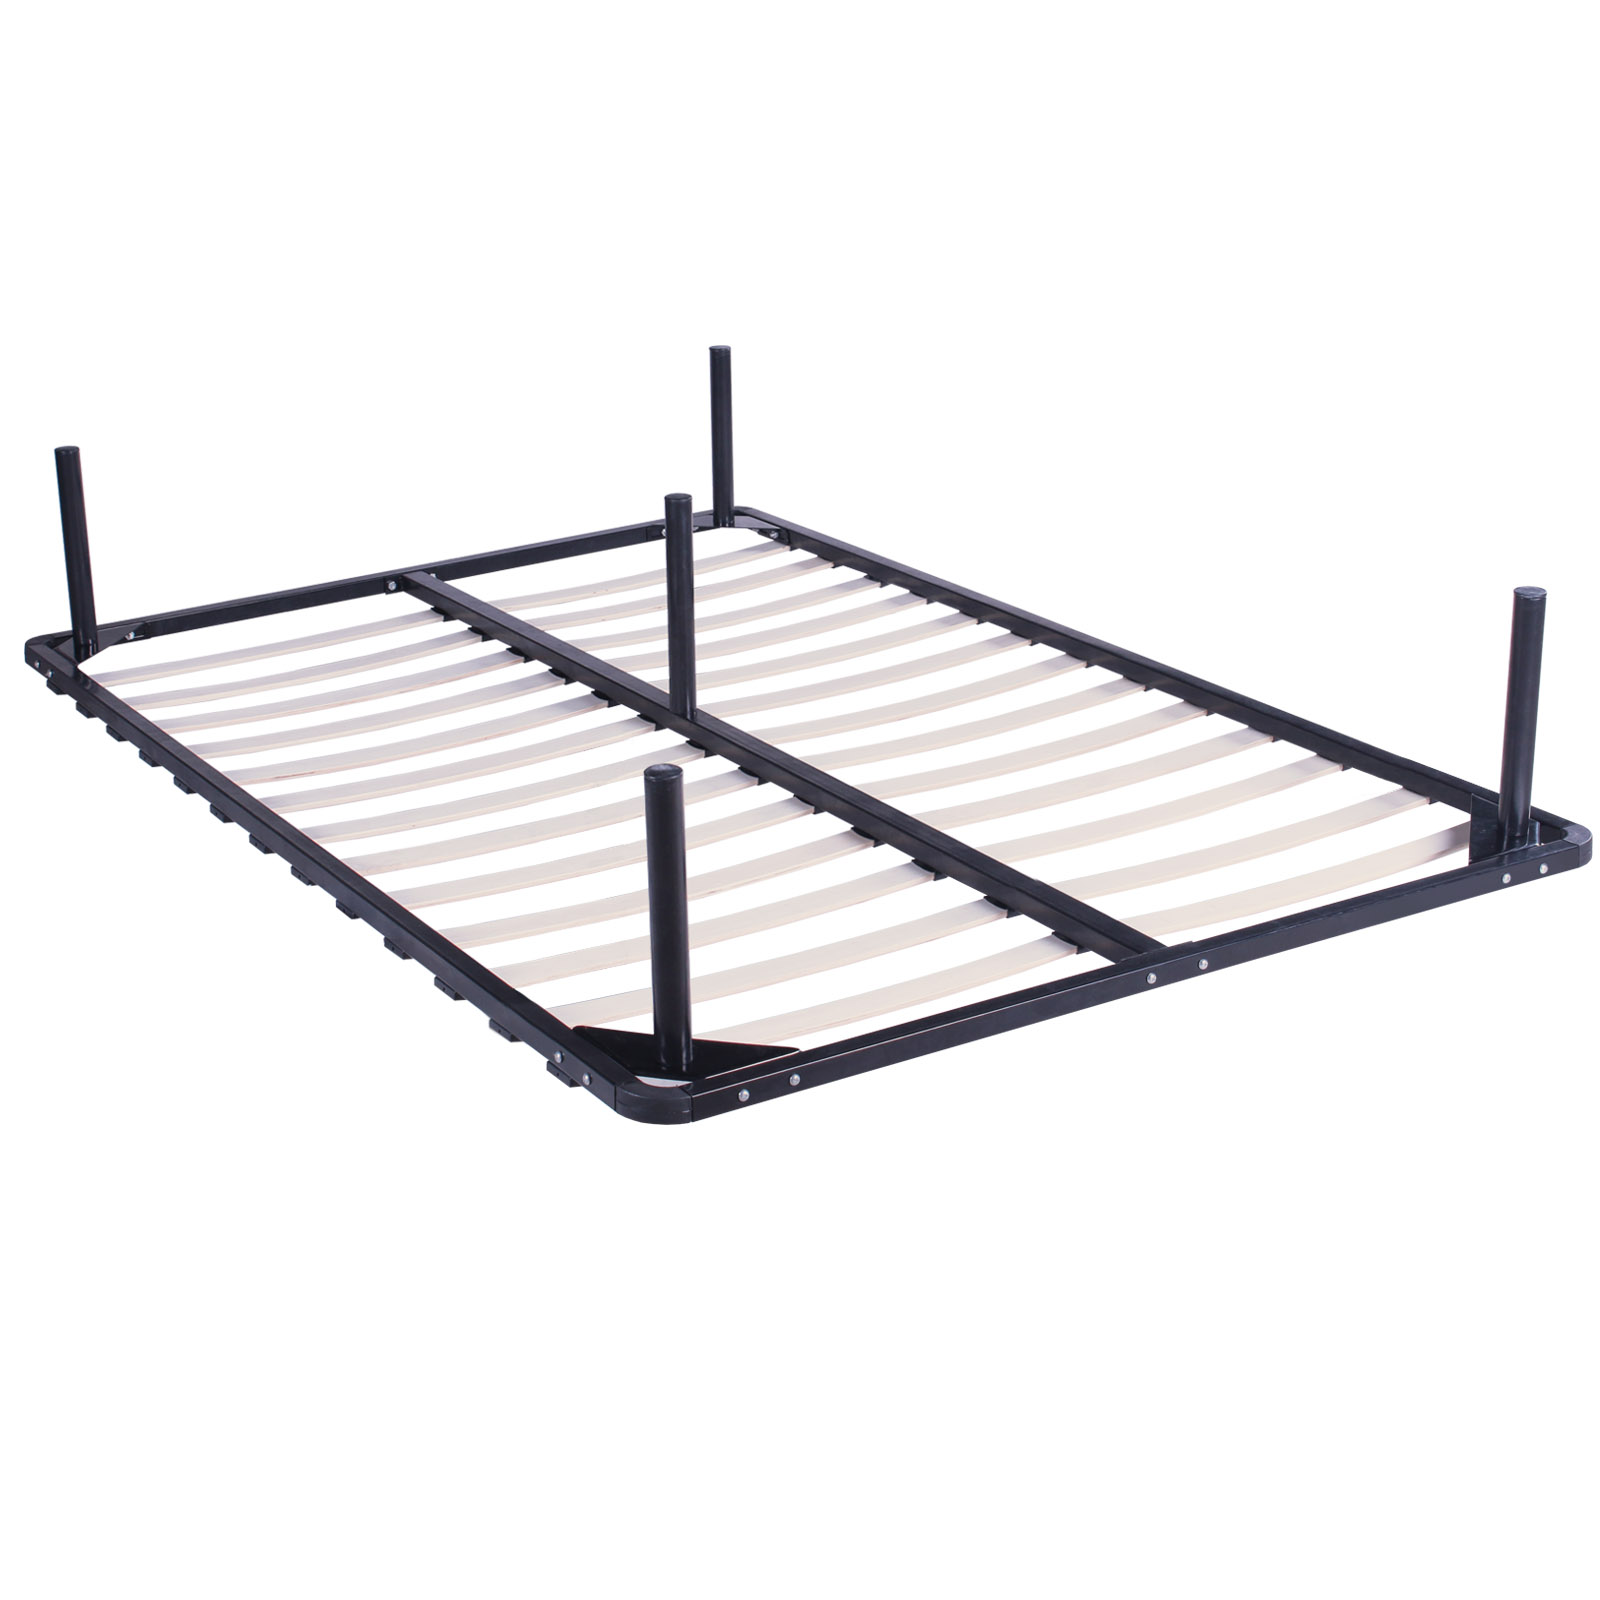 Queen Size Wood Slats Metal Bed Frame Platform Bedroom